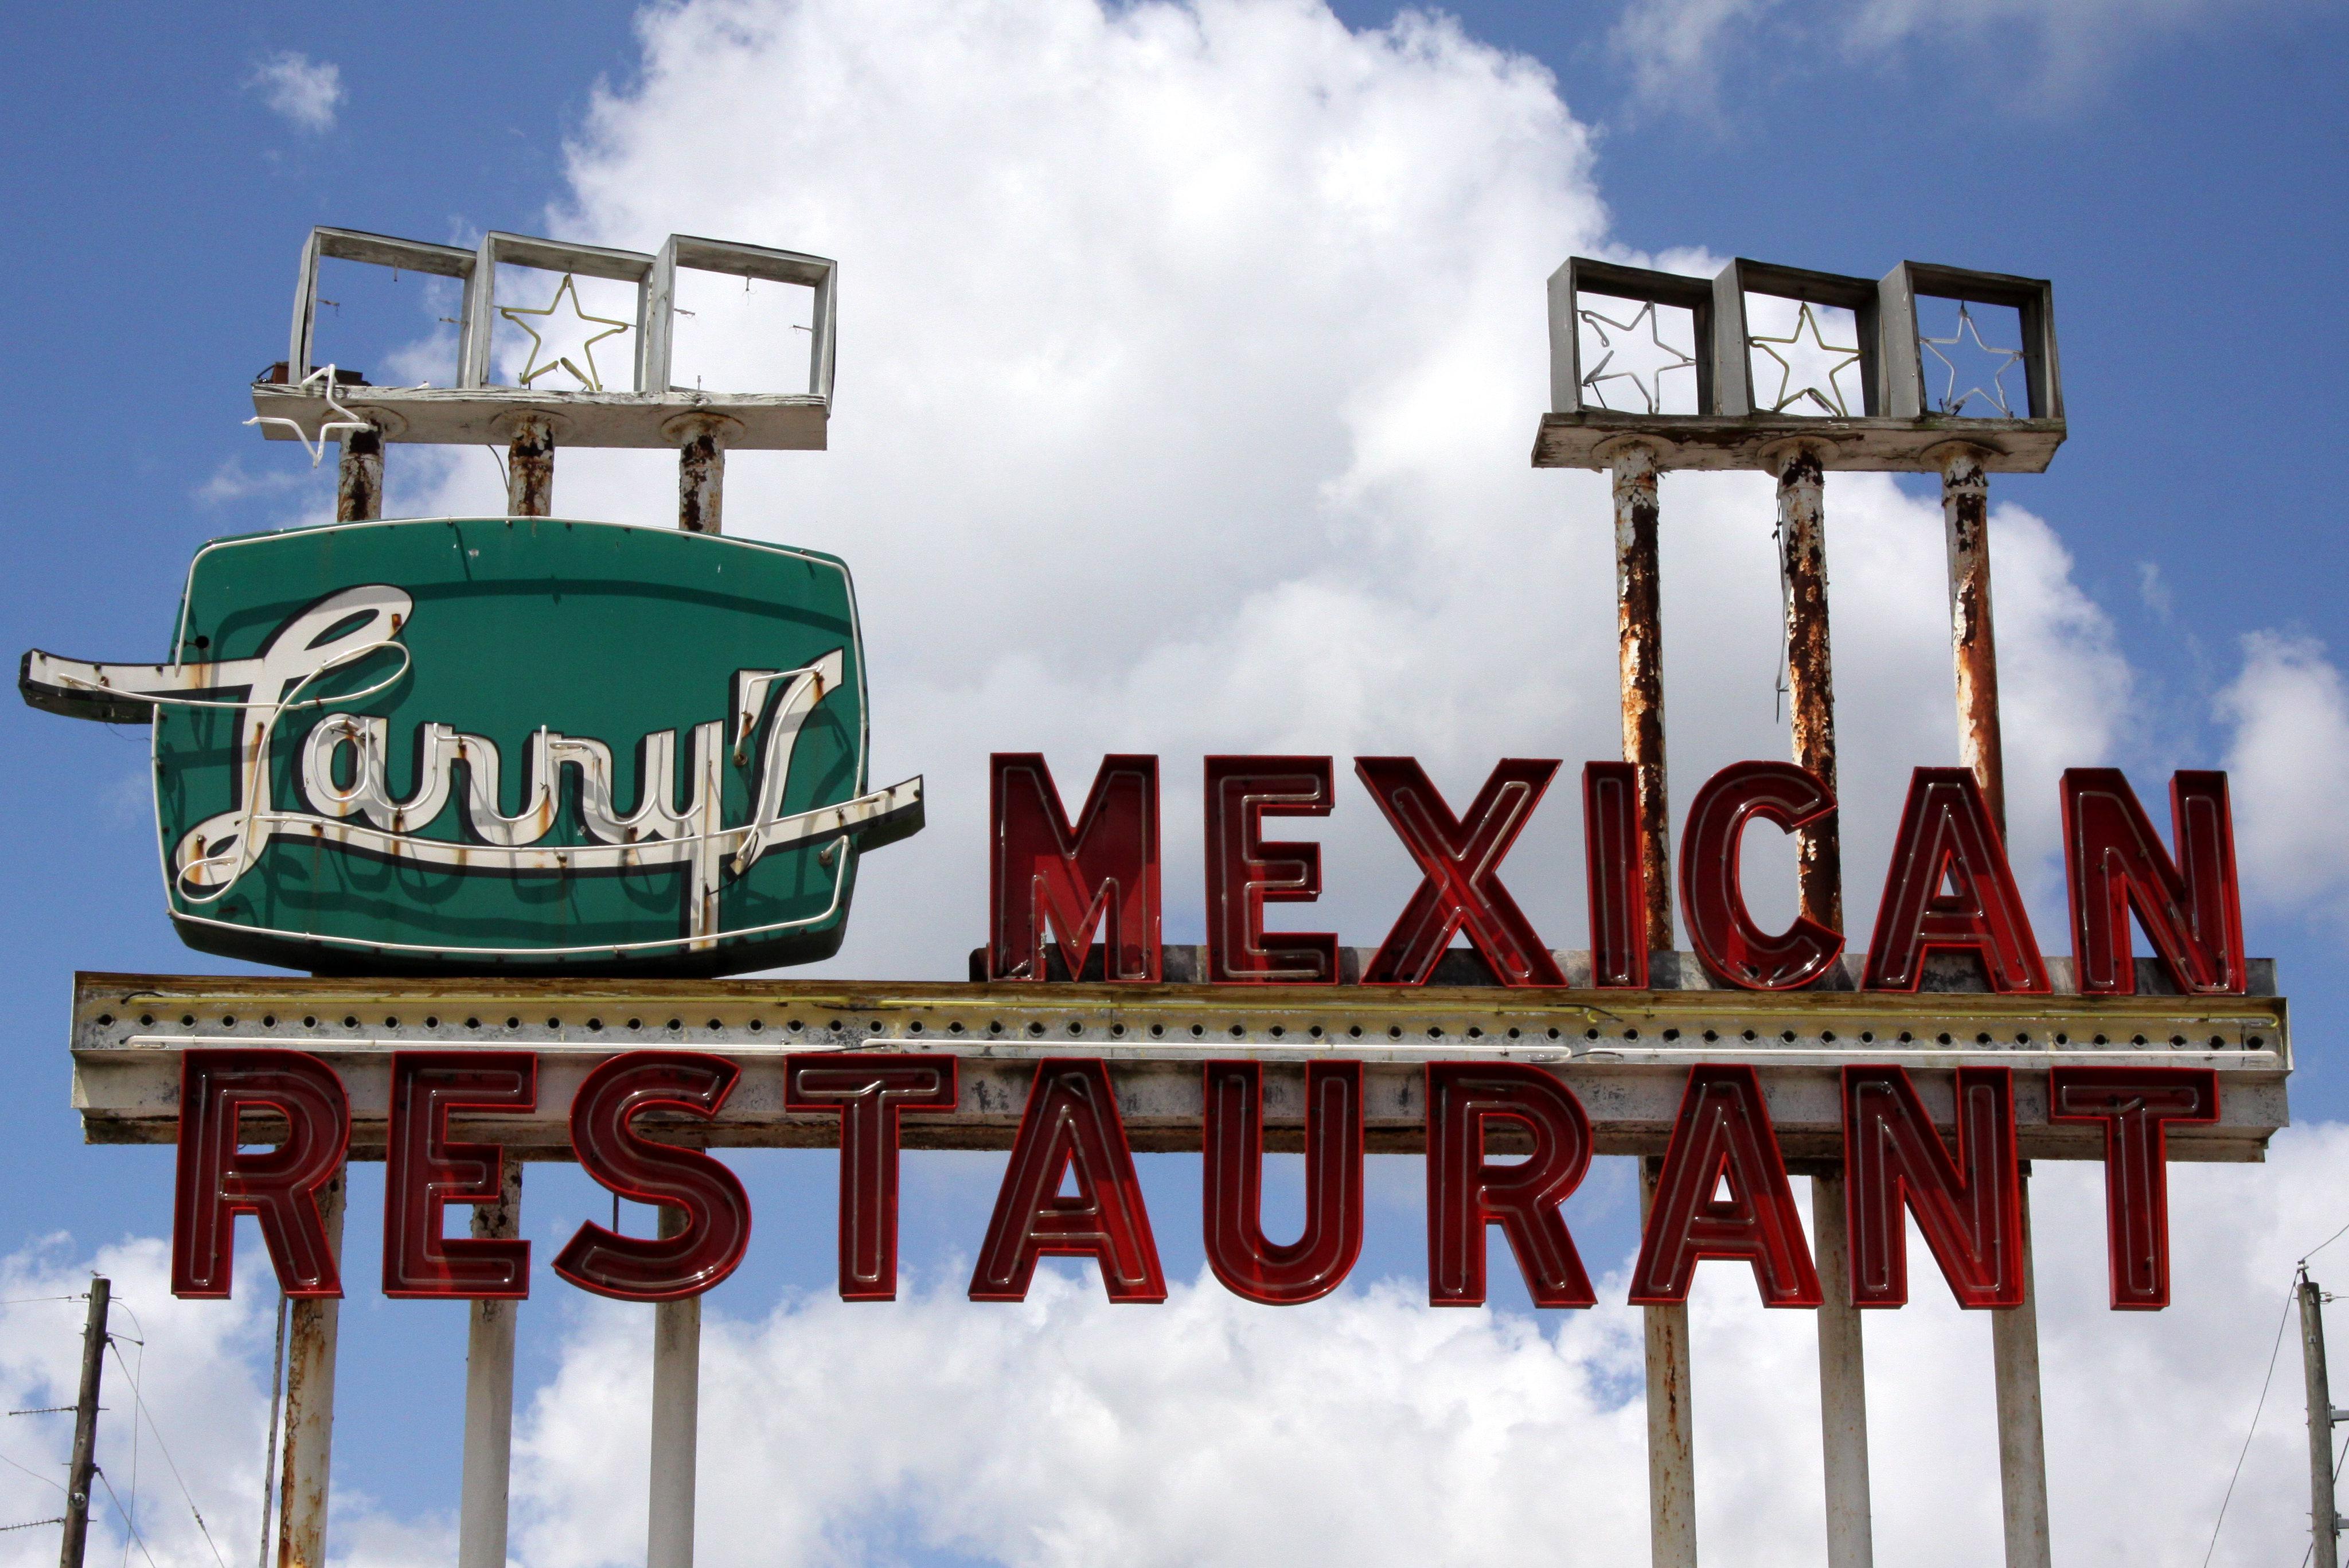 Larry's Original Mexican Restaurant - 116 East Highway 90 Alternate No. 3720, Richmond, Texas U.S.A, - May 25, 2019